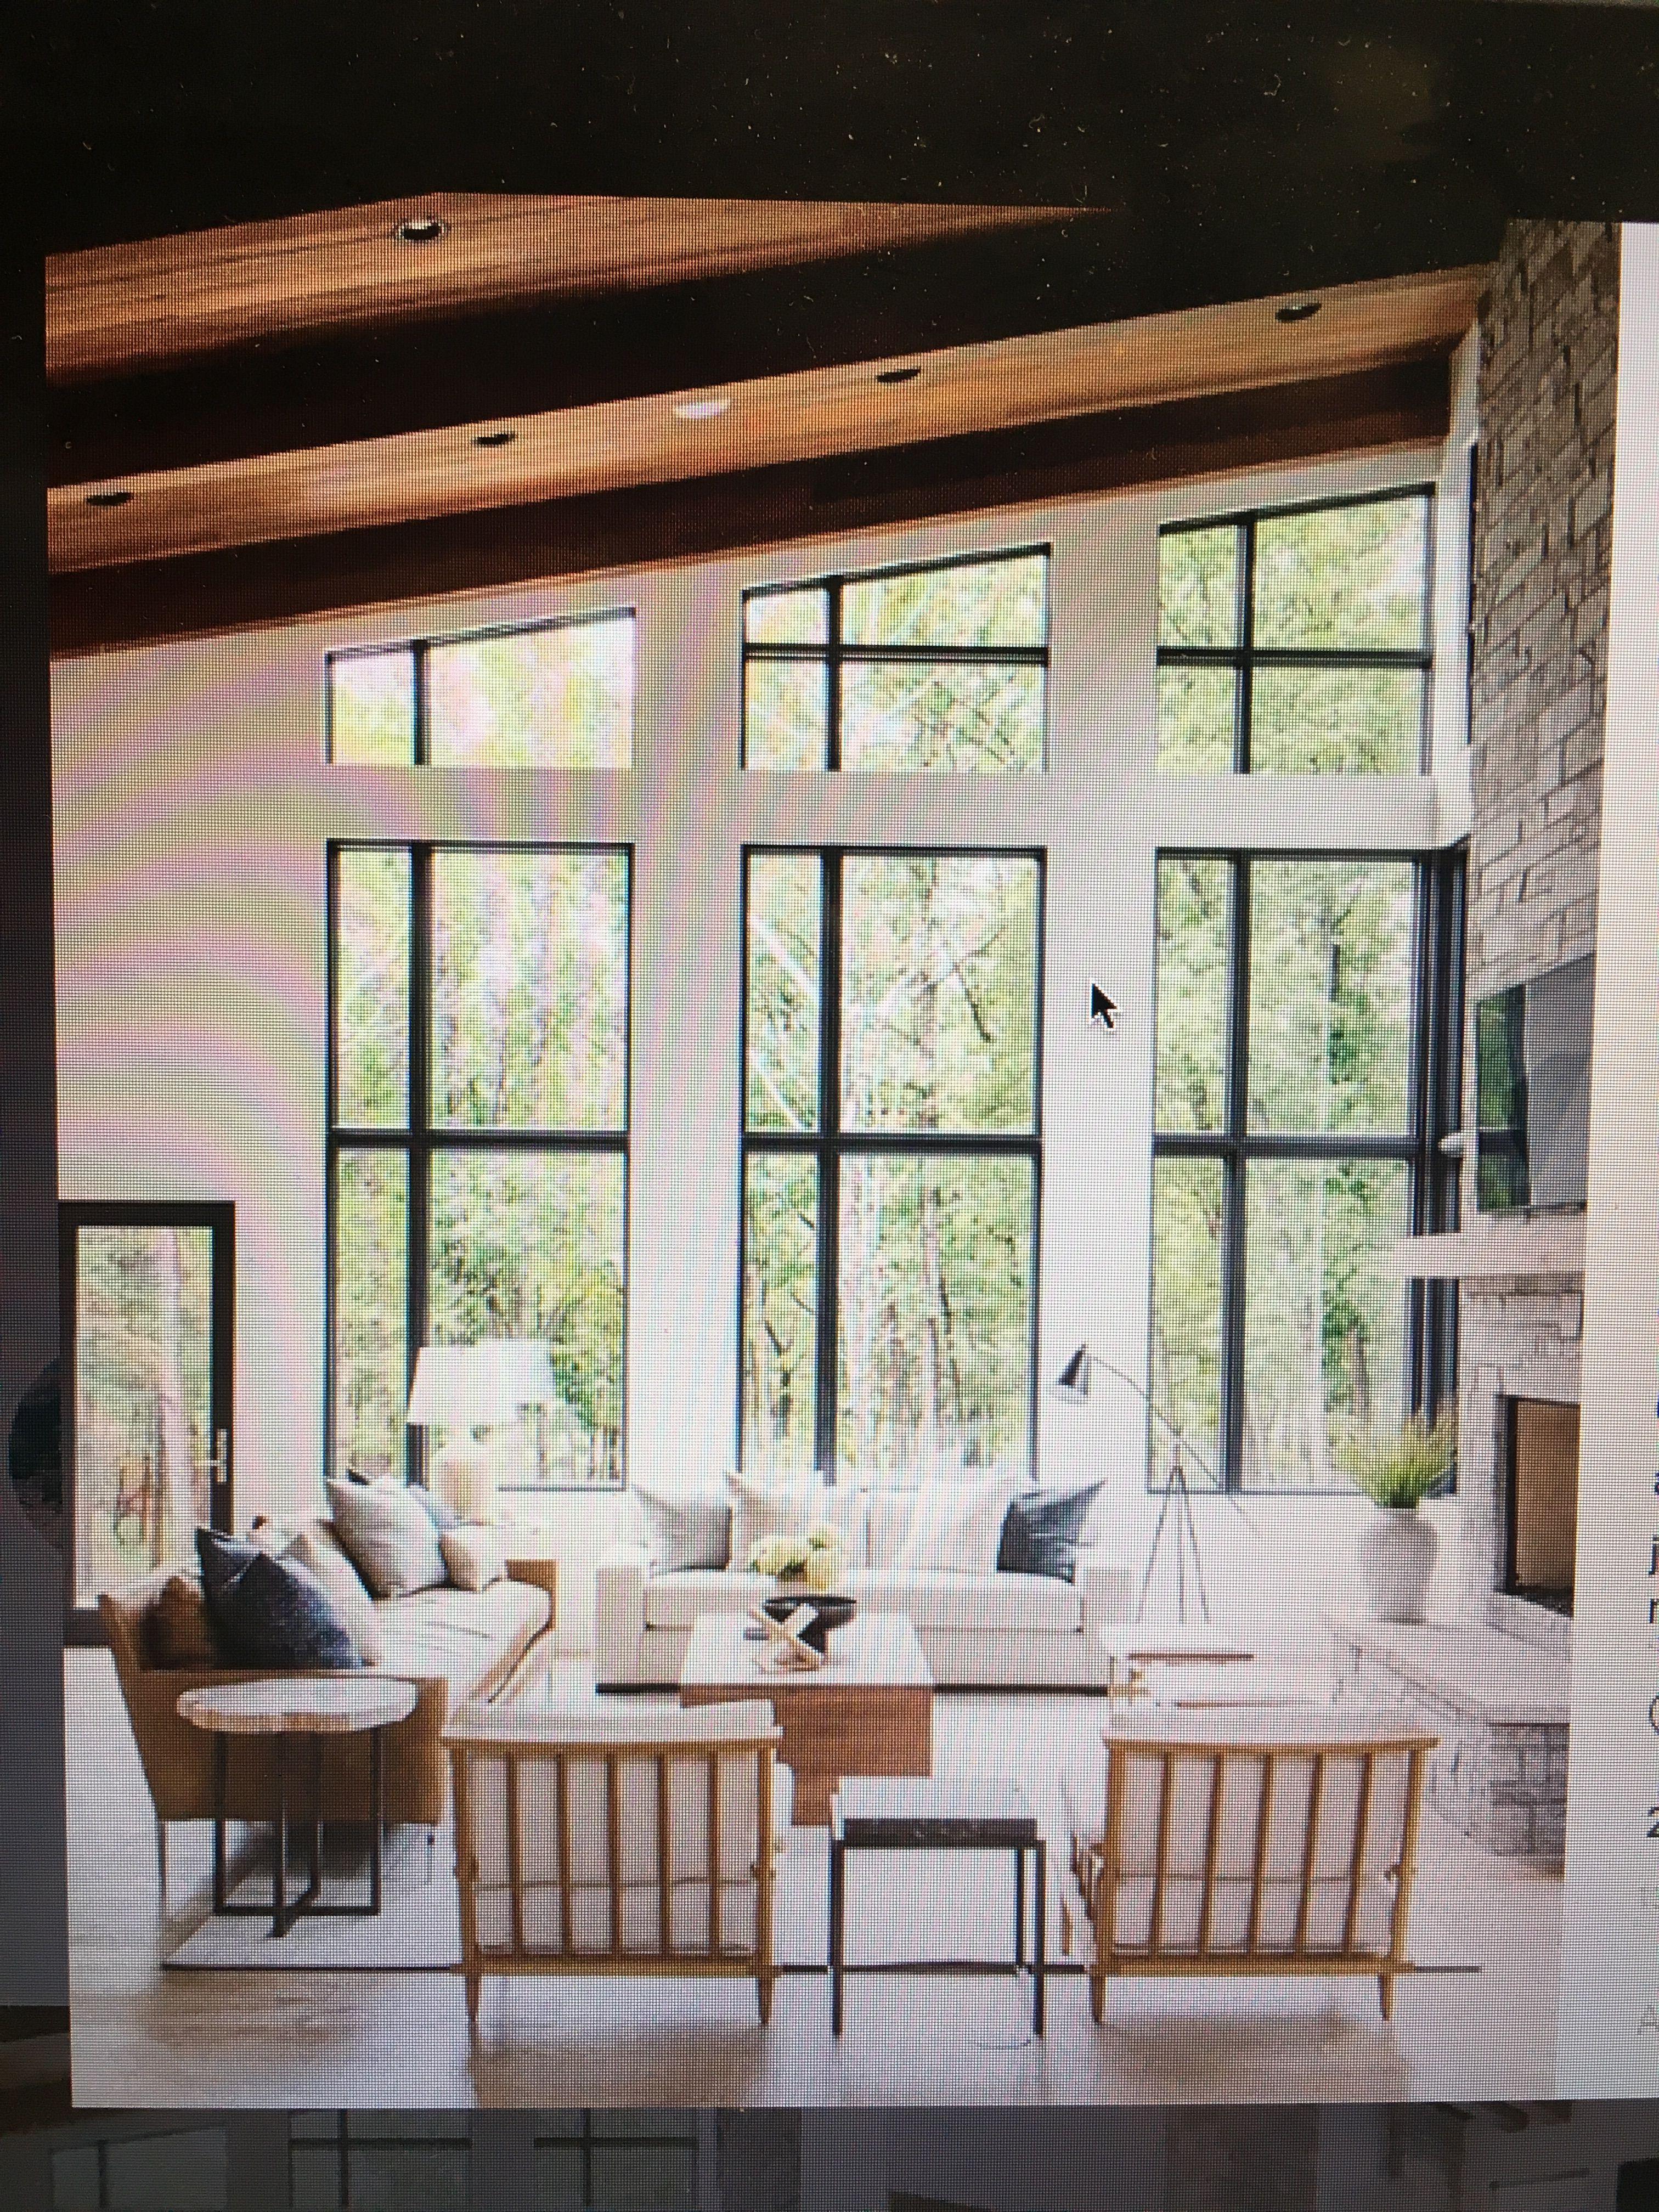 Studio Mcgee Modern Lake House House Interior Home Decor Home Living Room